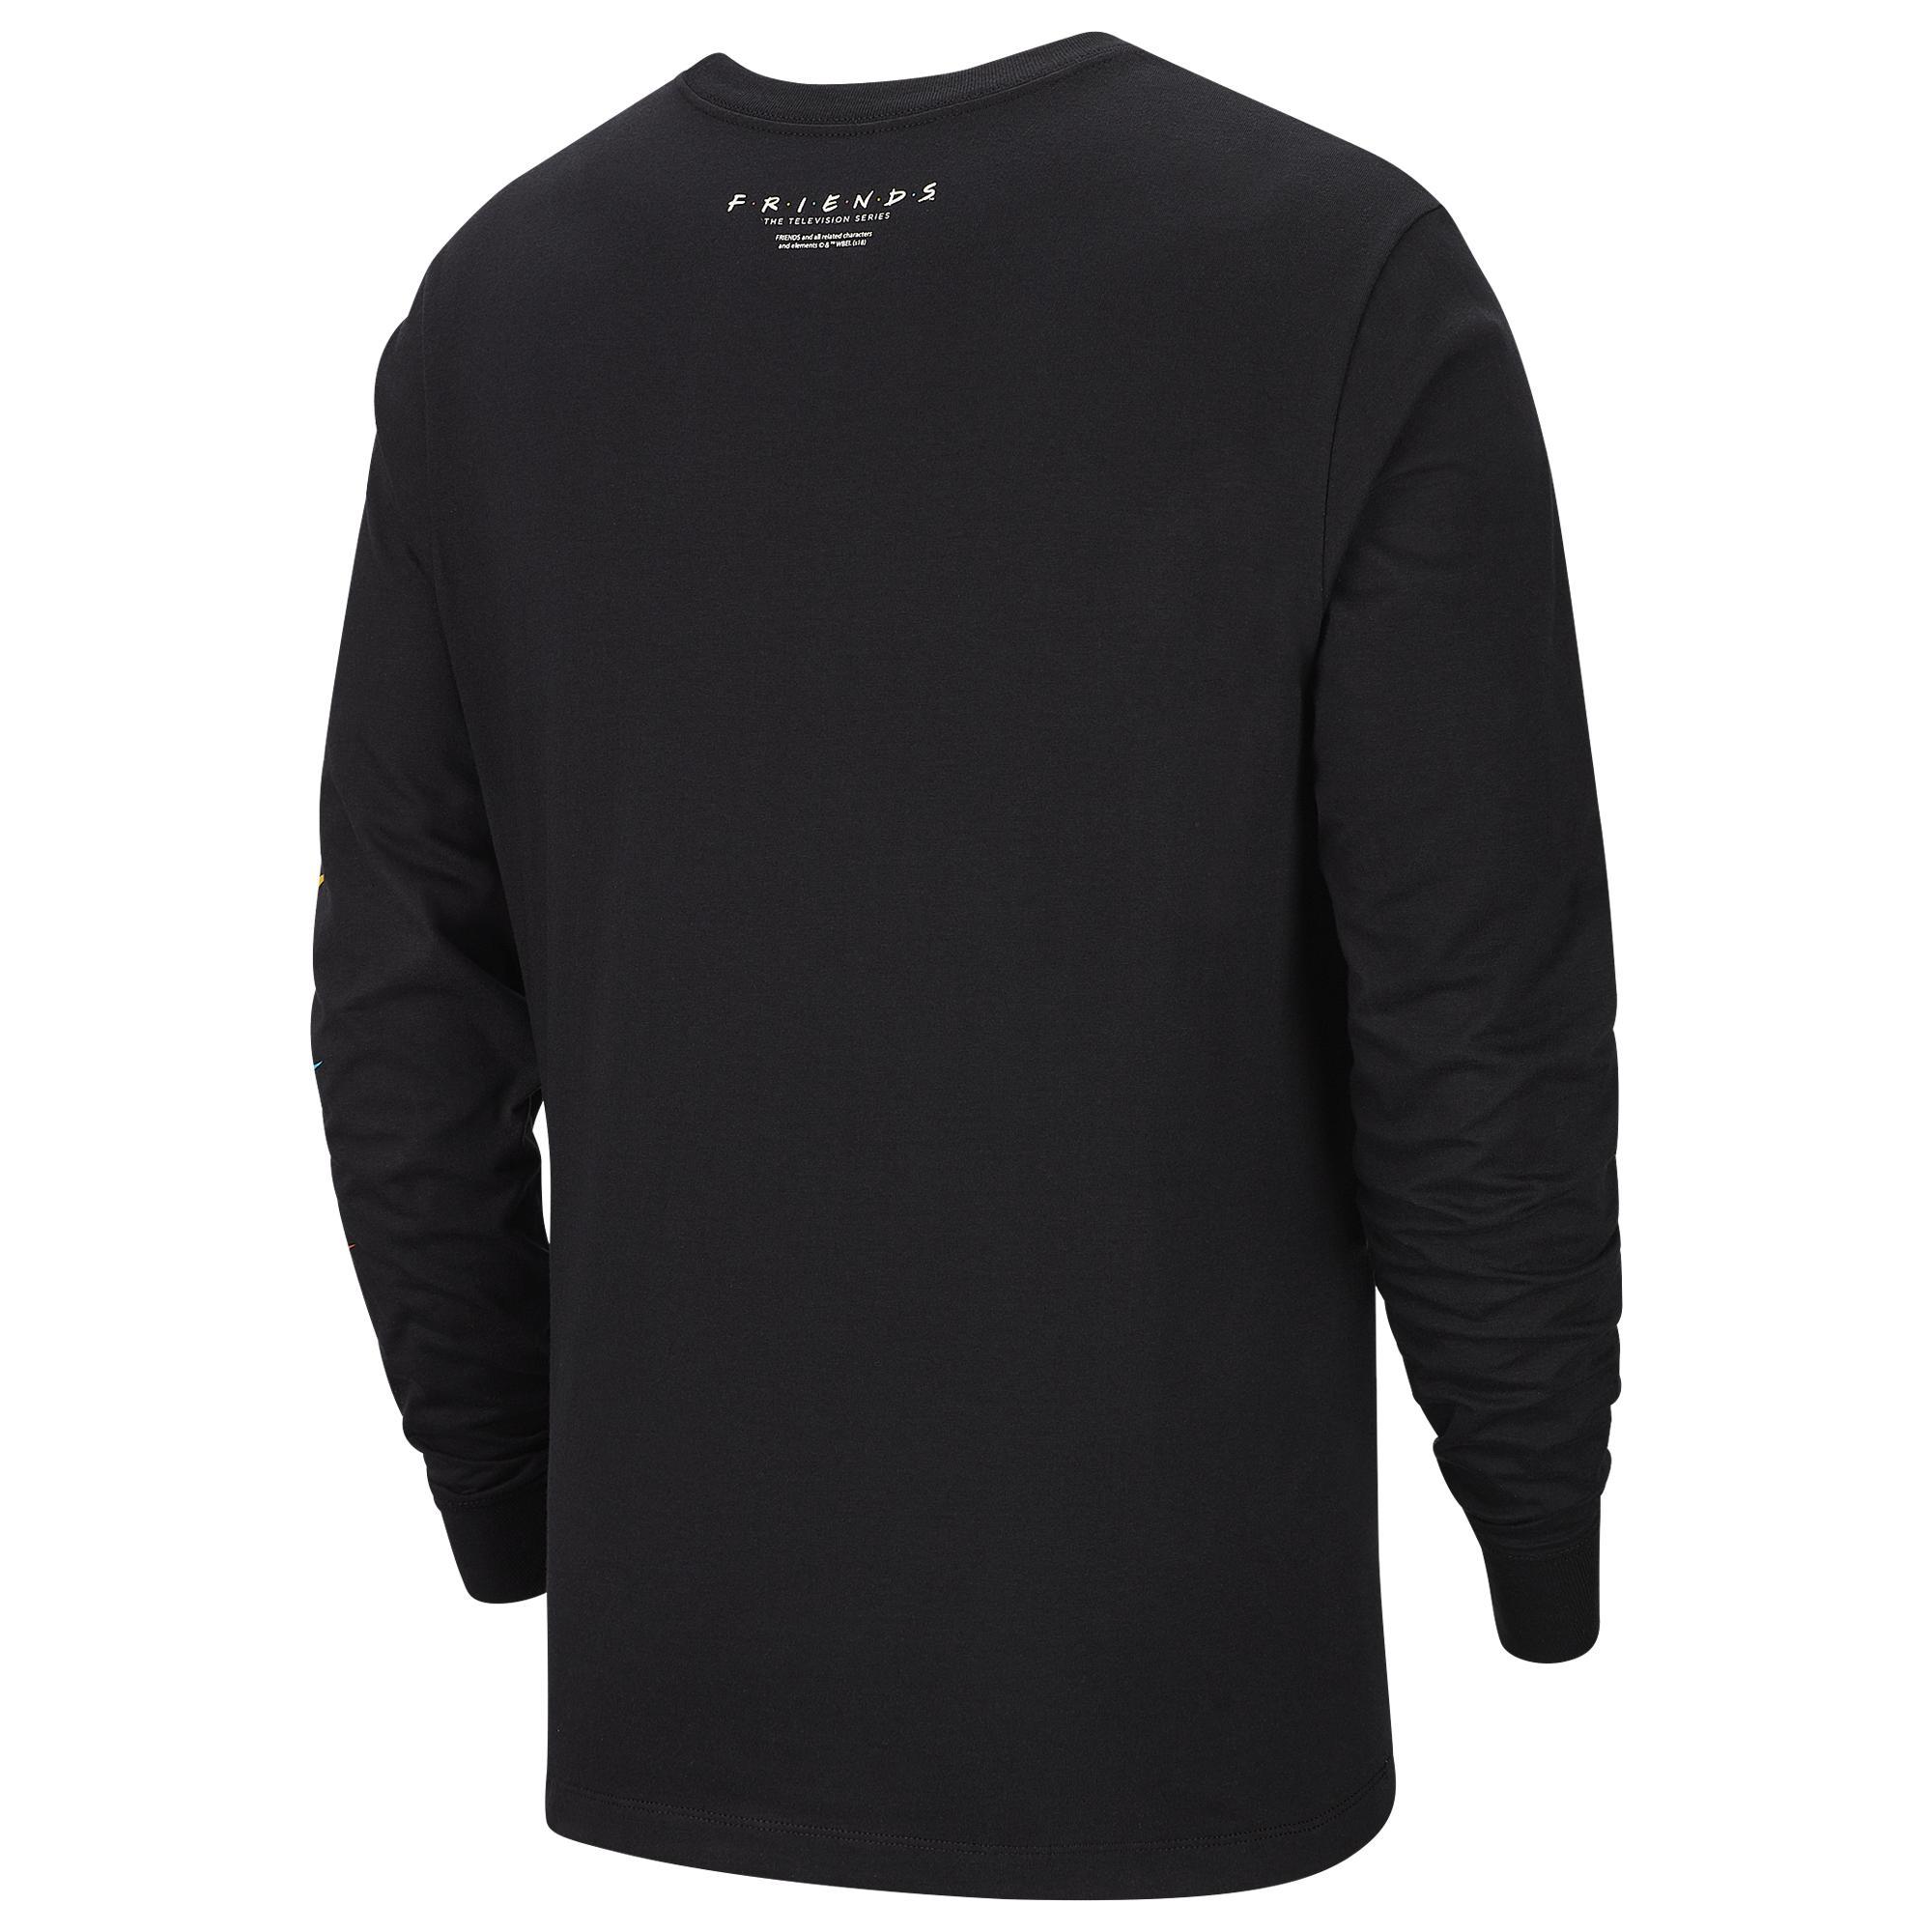 newest b8026 bf707 Men's Black Kyrie Friends Long Sleeve T-shirt